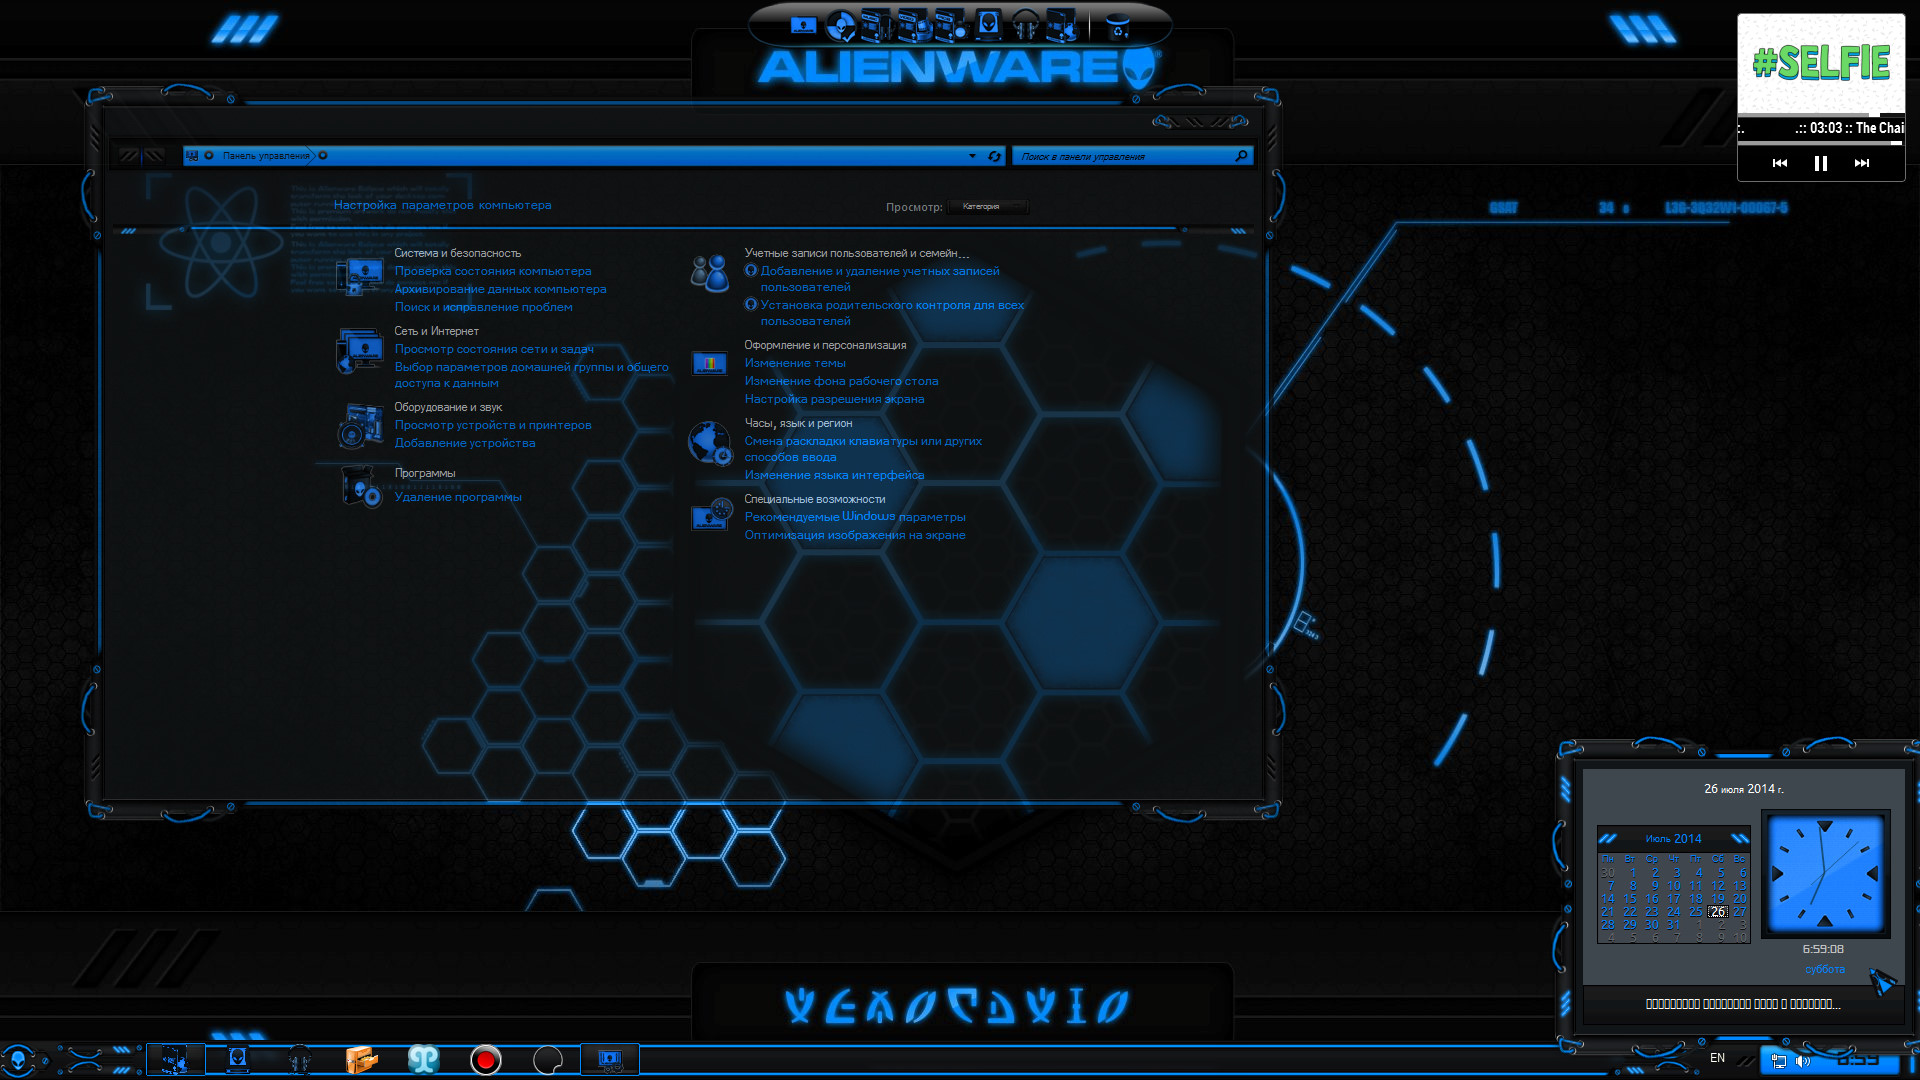 Скачать Alienware Eclipse Icons / 7tsp иконки для ...: temysoft.ru/news/alienware_eclipse_icons_7tsp/2013-10-05-531